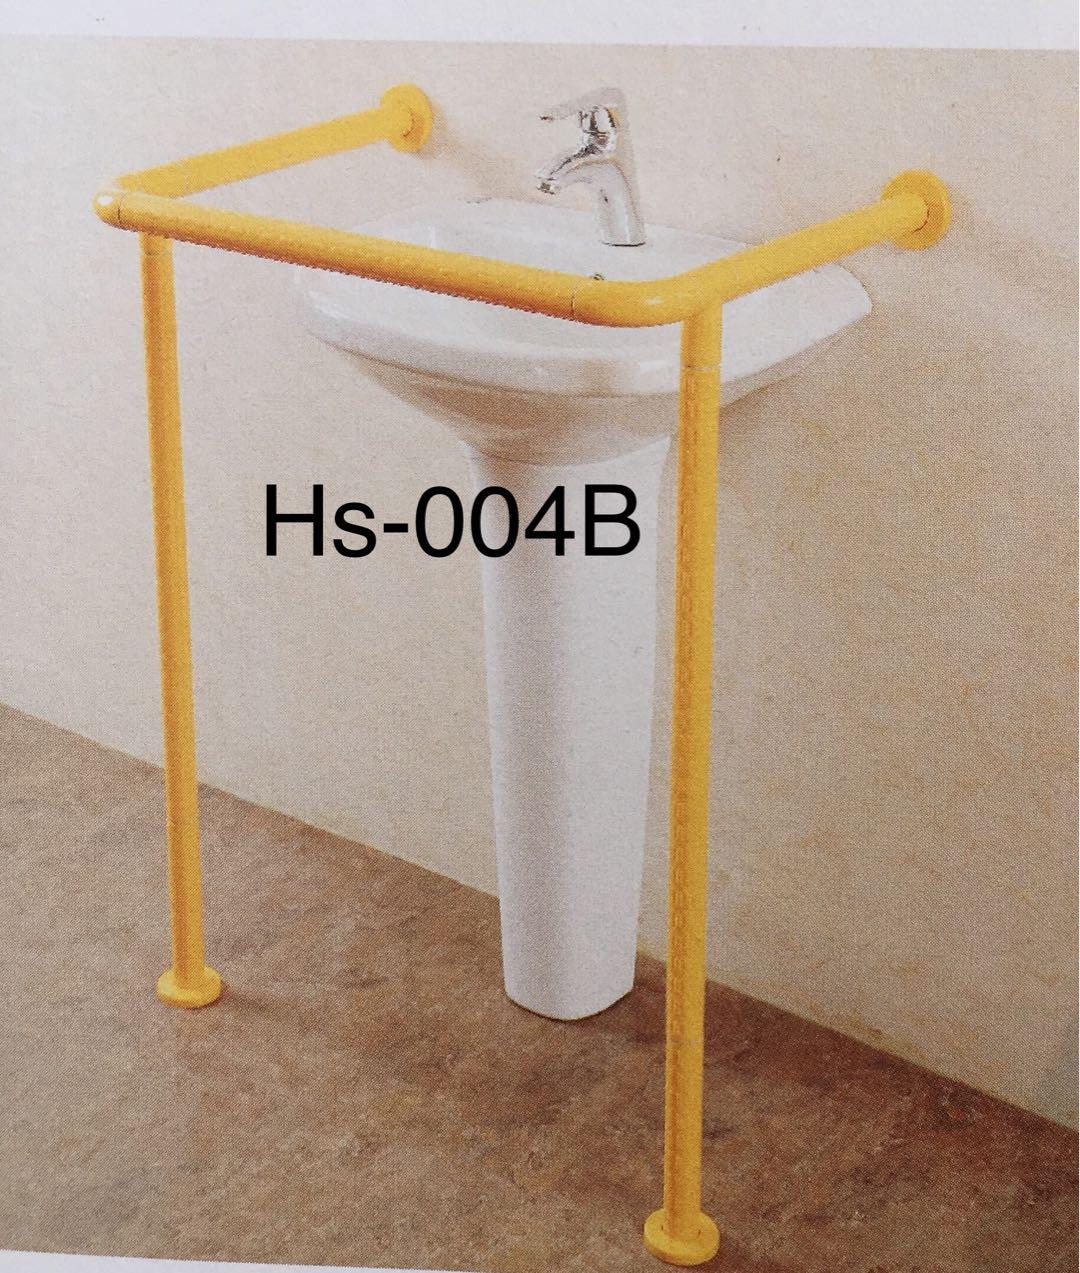 HS-004B无障碍扶手